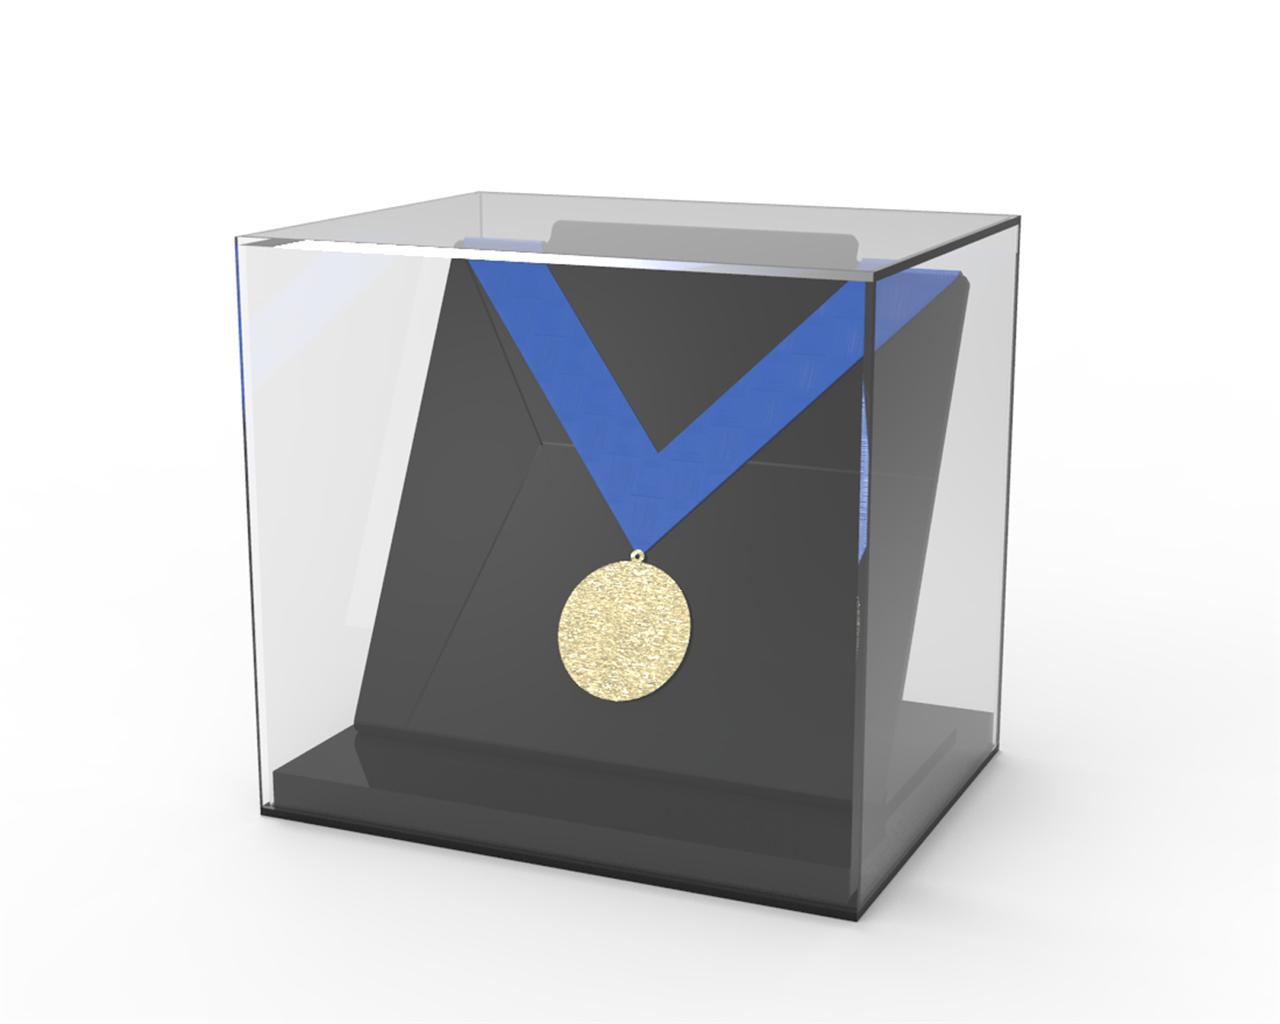 Medal-Acrylic-Perspex-Display-Case-Freestanding-Single-Medal